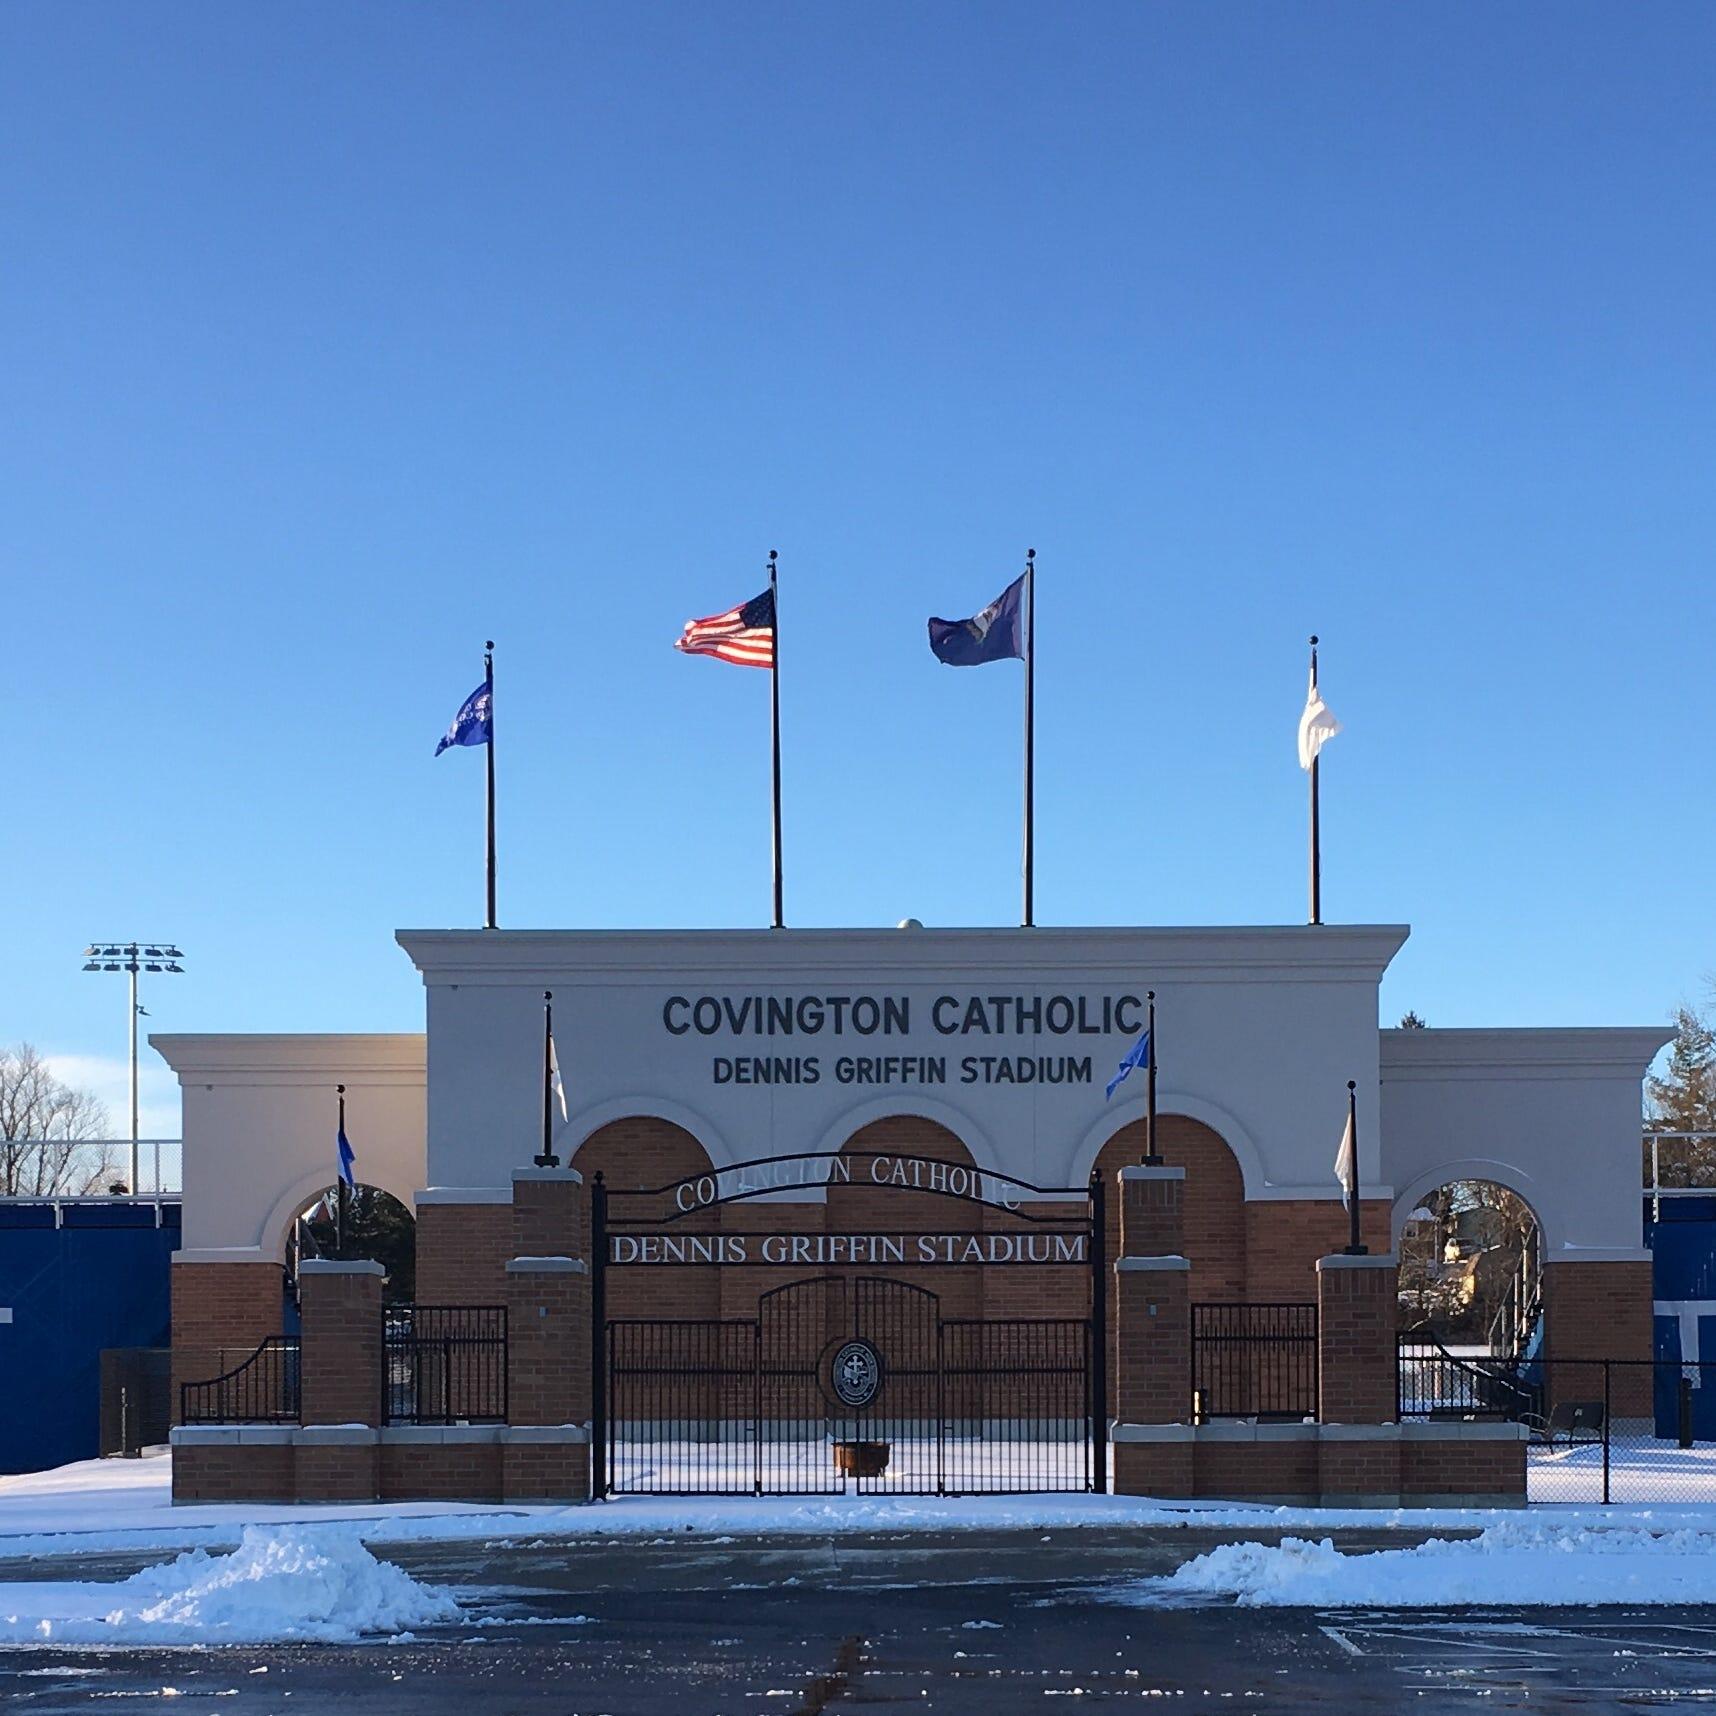 Authorities investigating threats against Covington Catholic High School